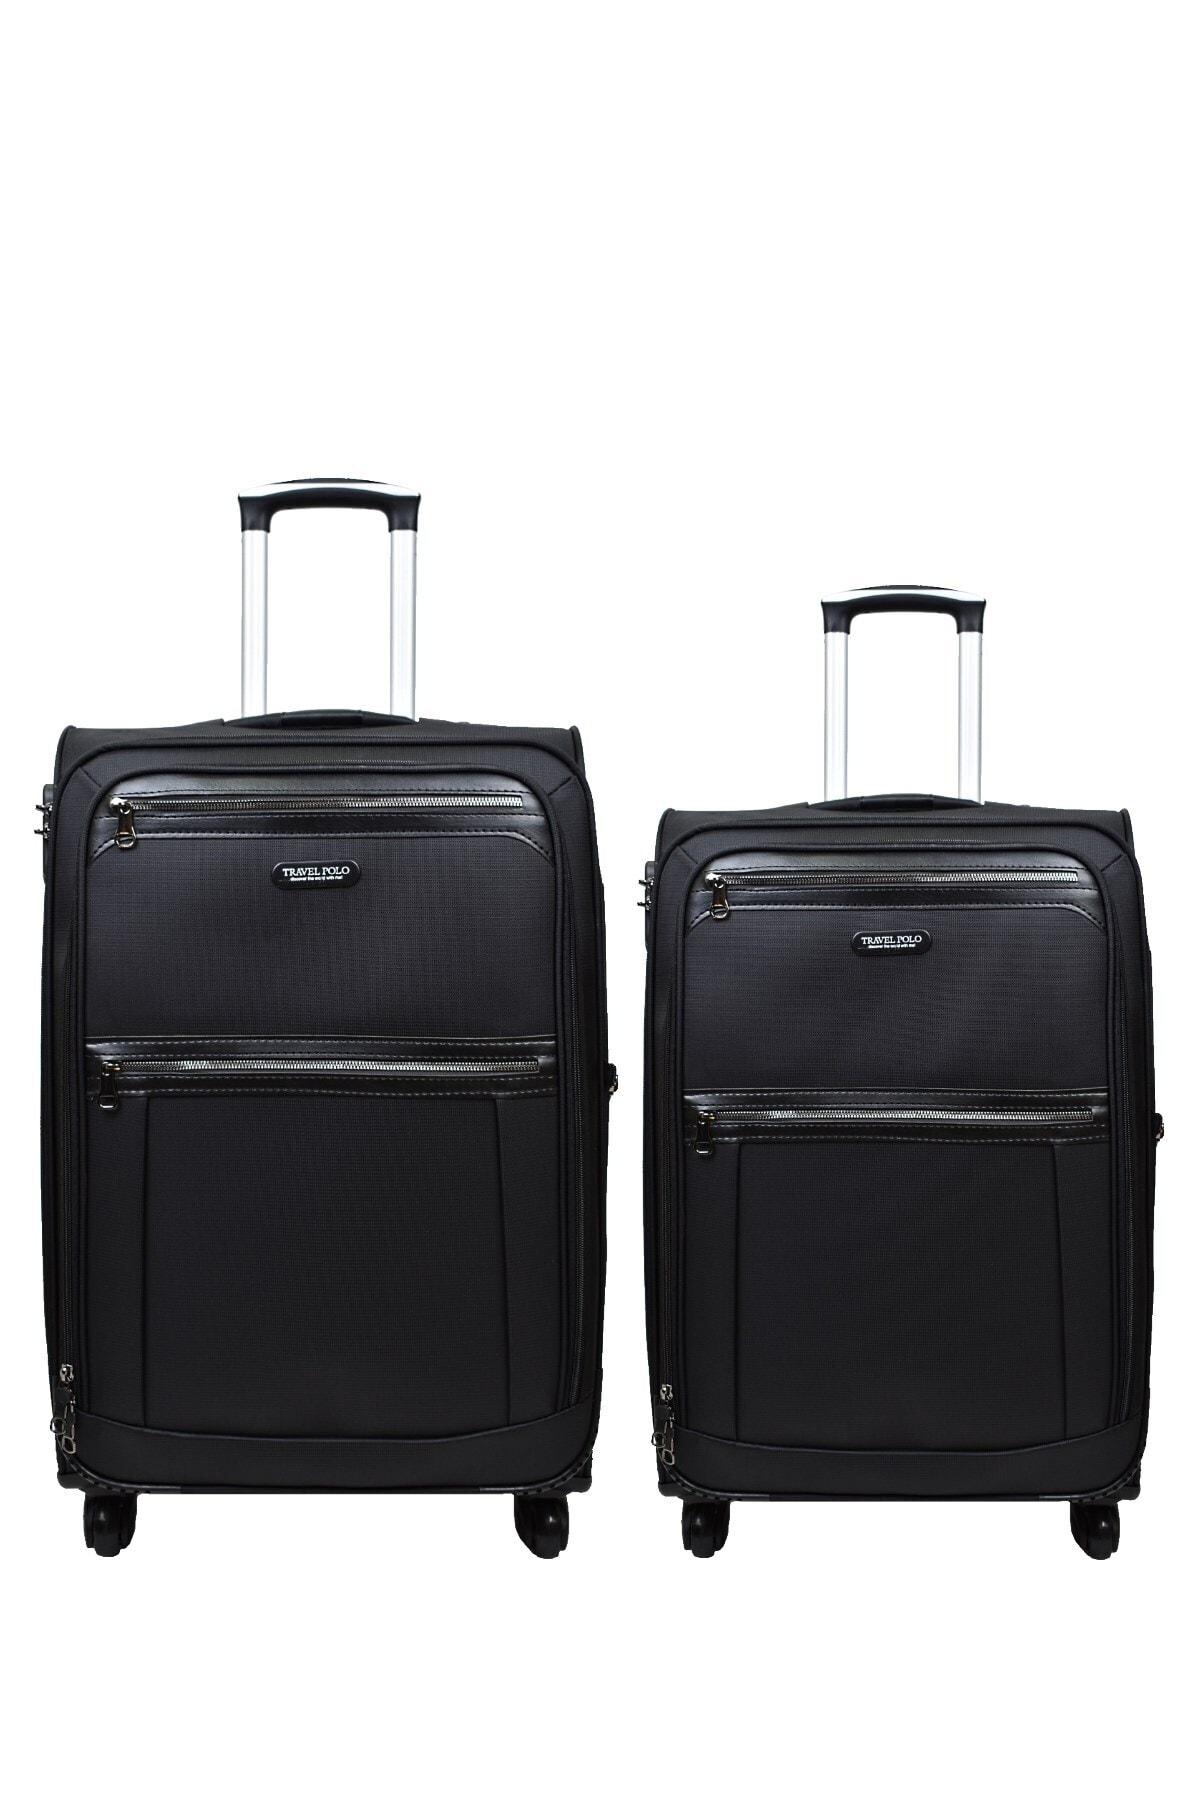 Anka 2'li Valiz Seti Travel Polo Lüx Kumaş Orta Boy Ve Kabin Boy Siyah 2'li Set 1